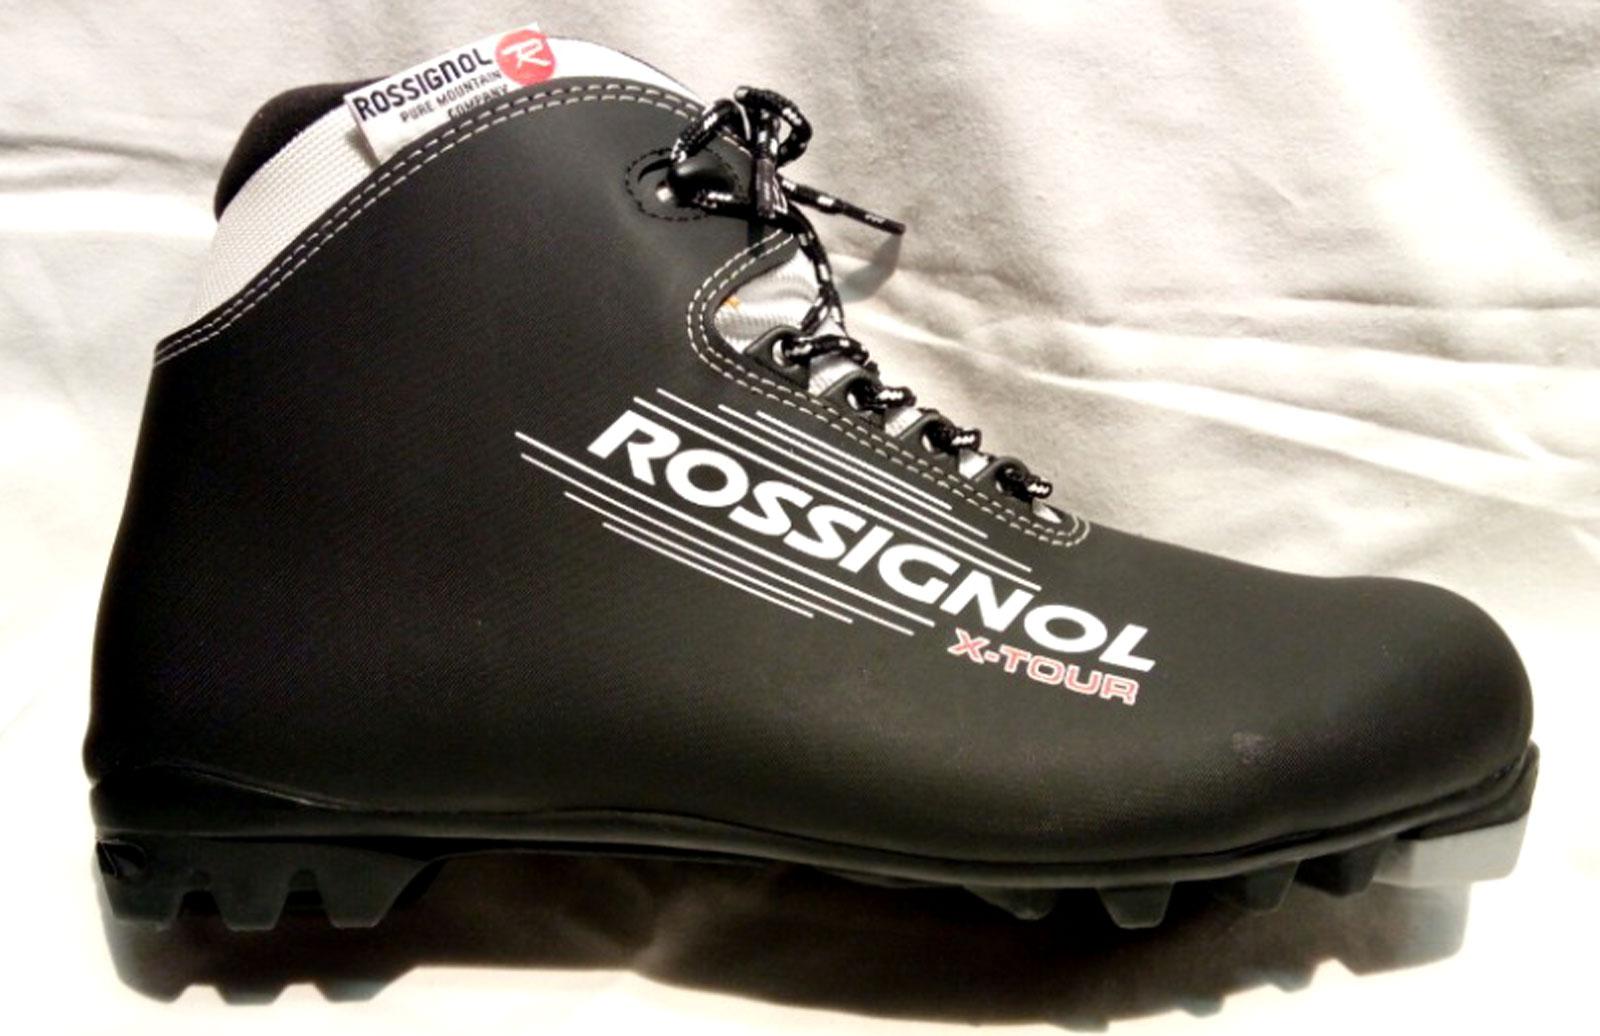 Rossignol X TOUR Velikost bot: 45